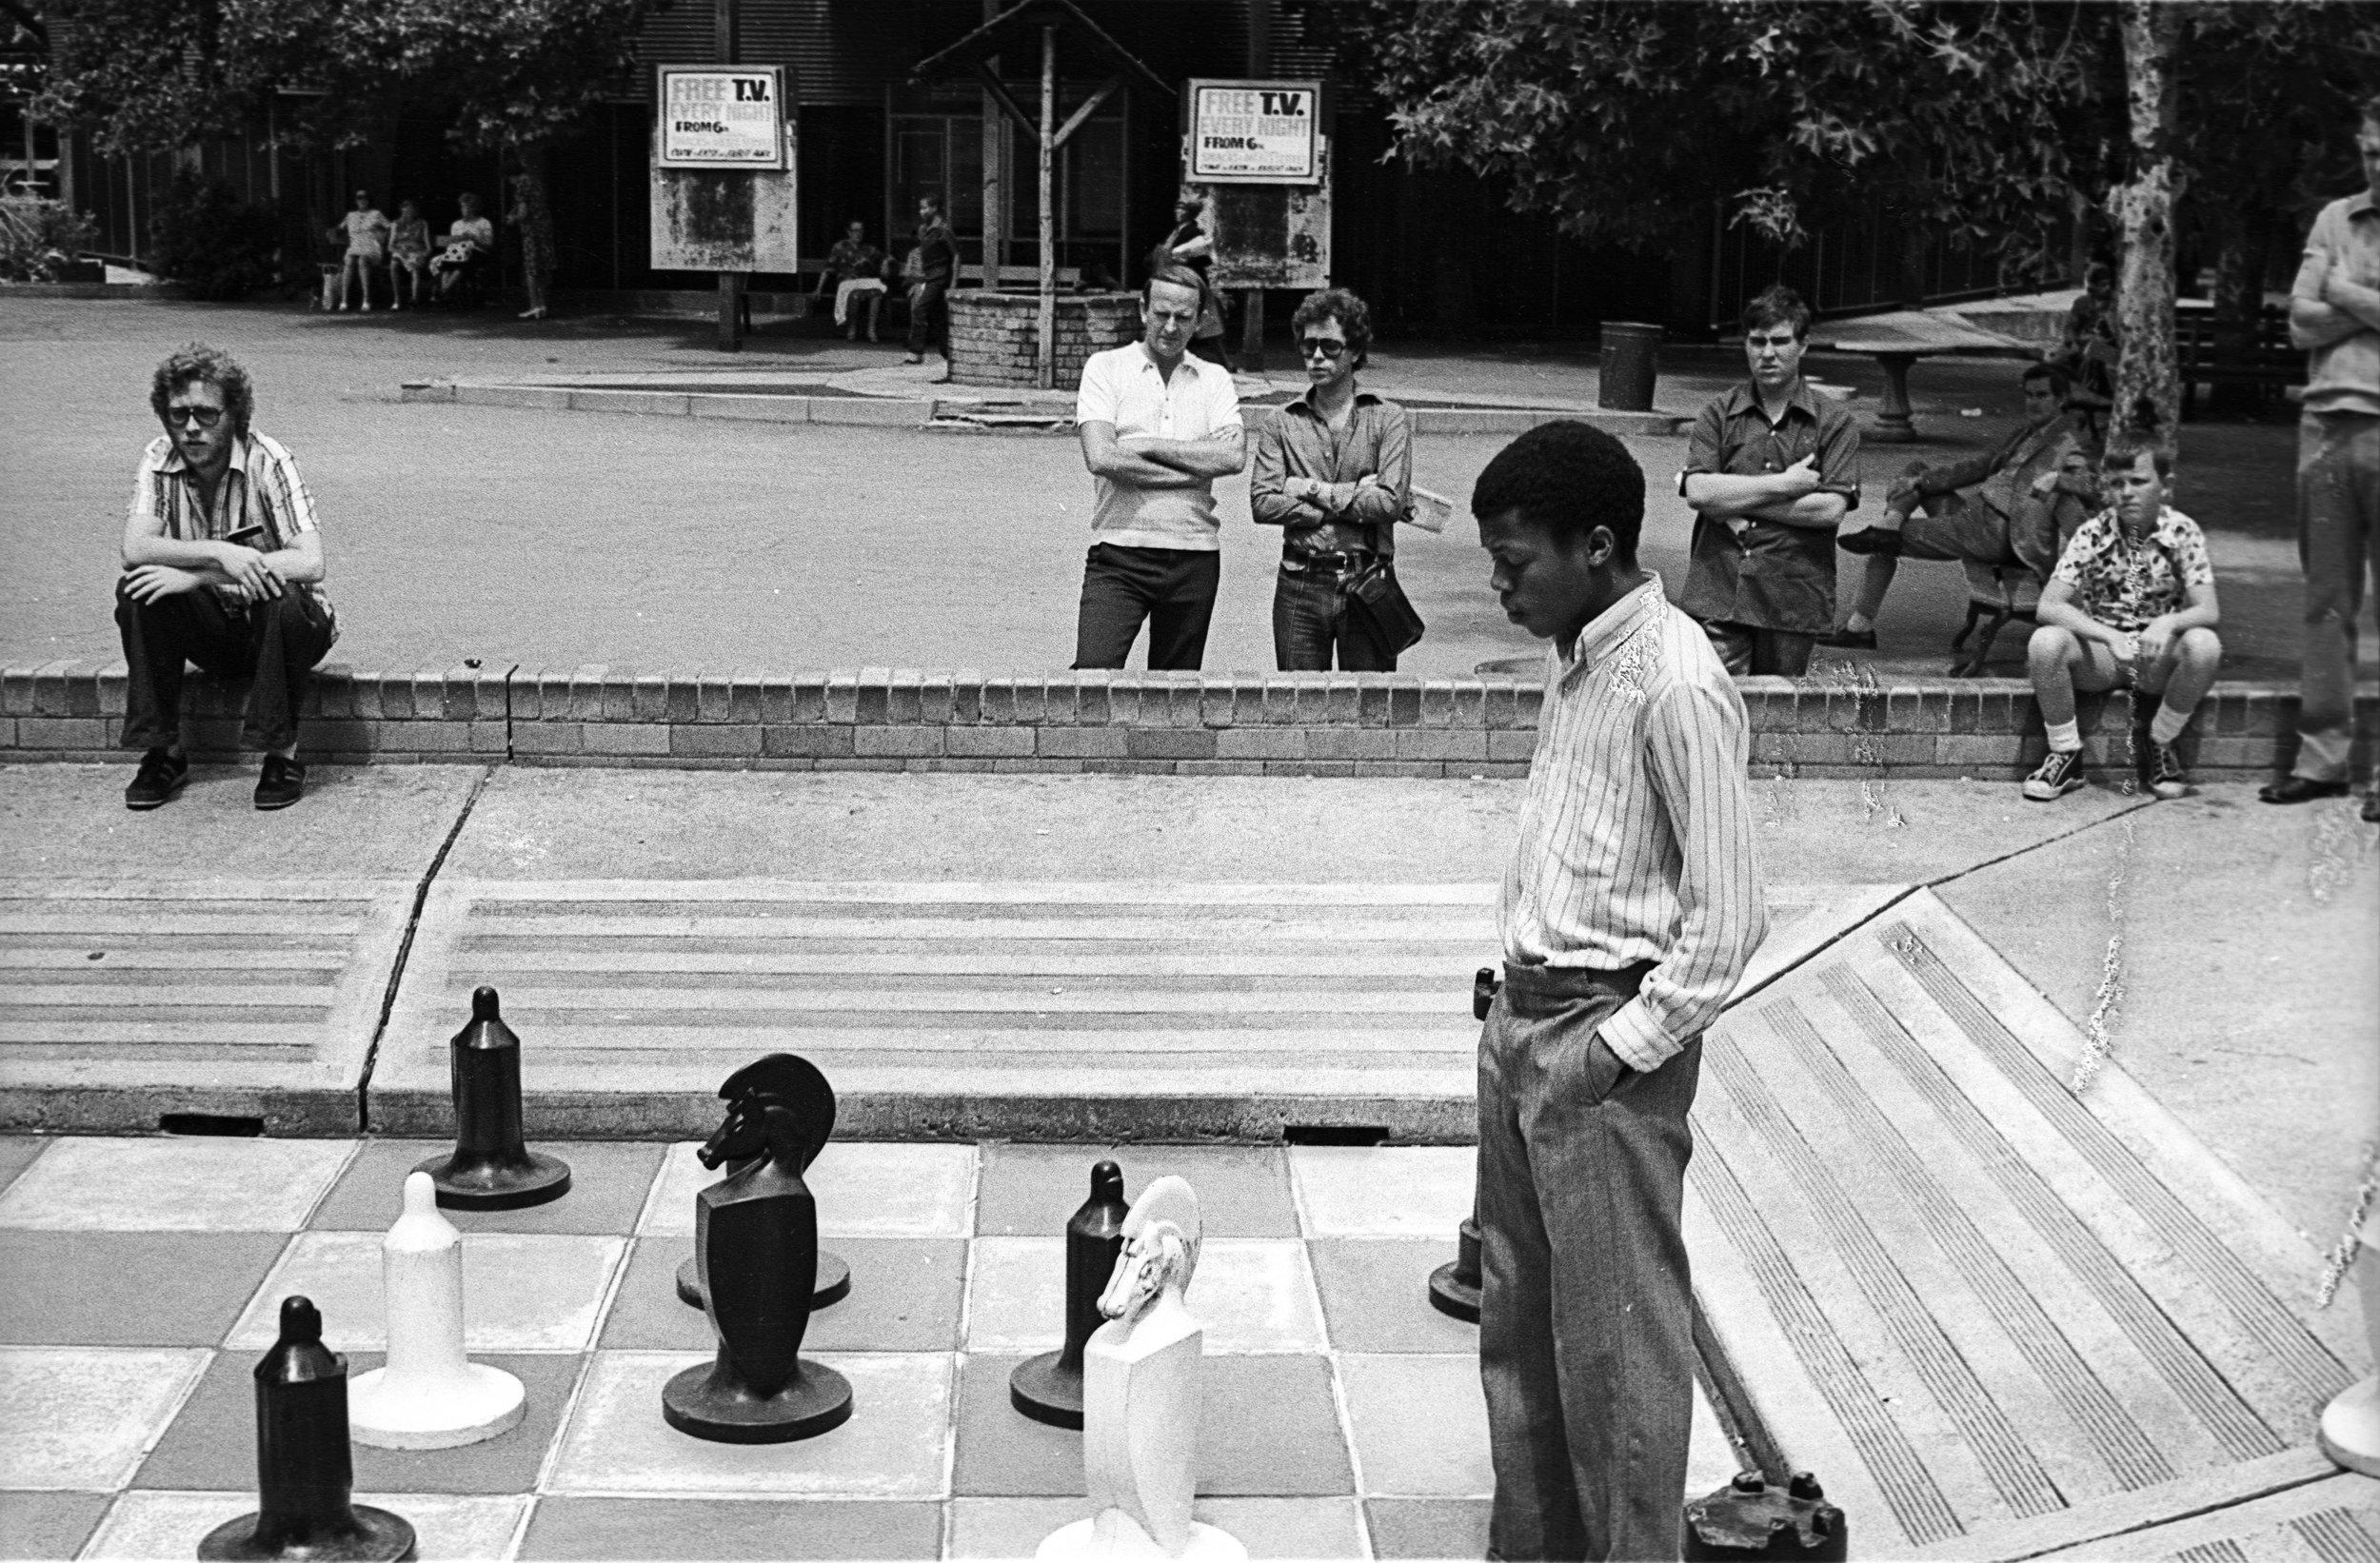 Chess in Joubert Park.